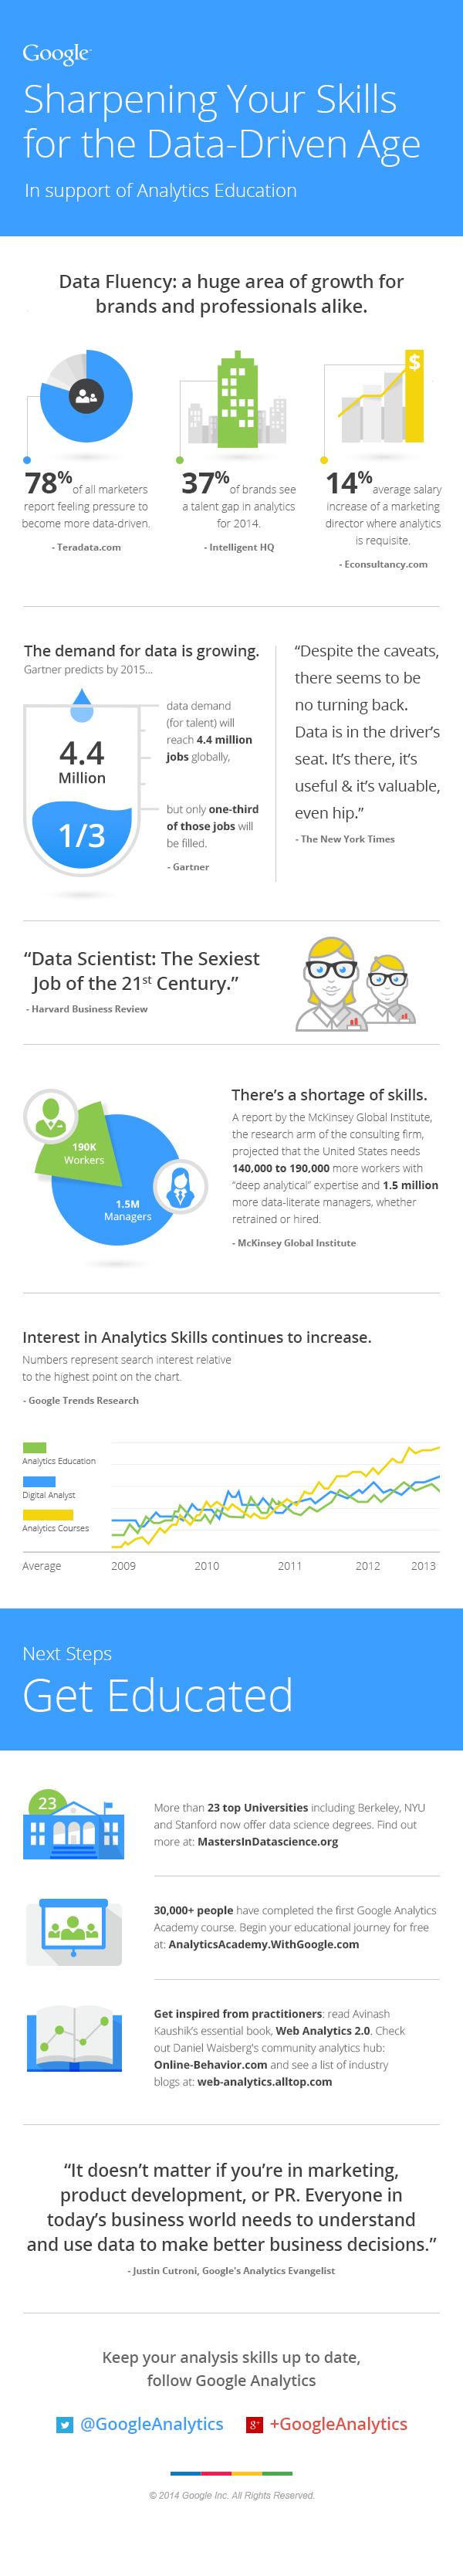 Google Analytics Education Infographic - 2014